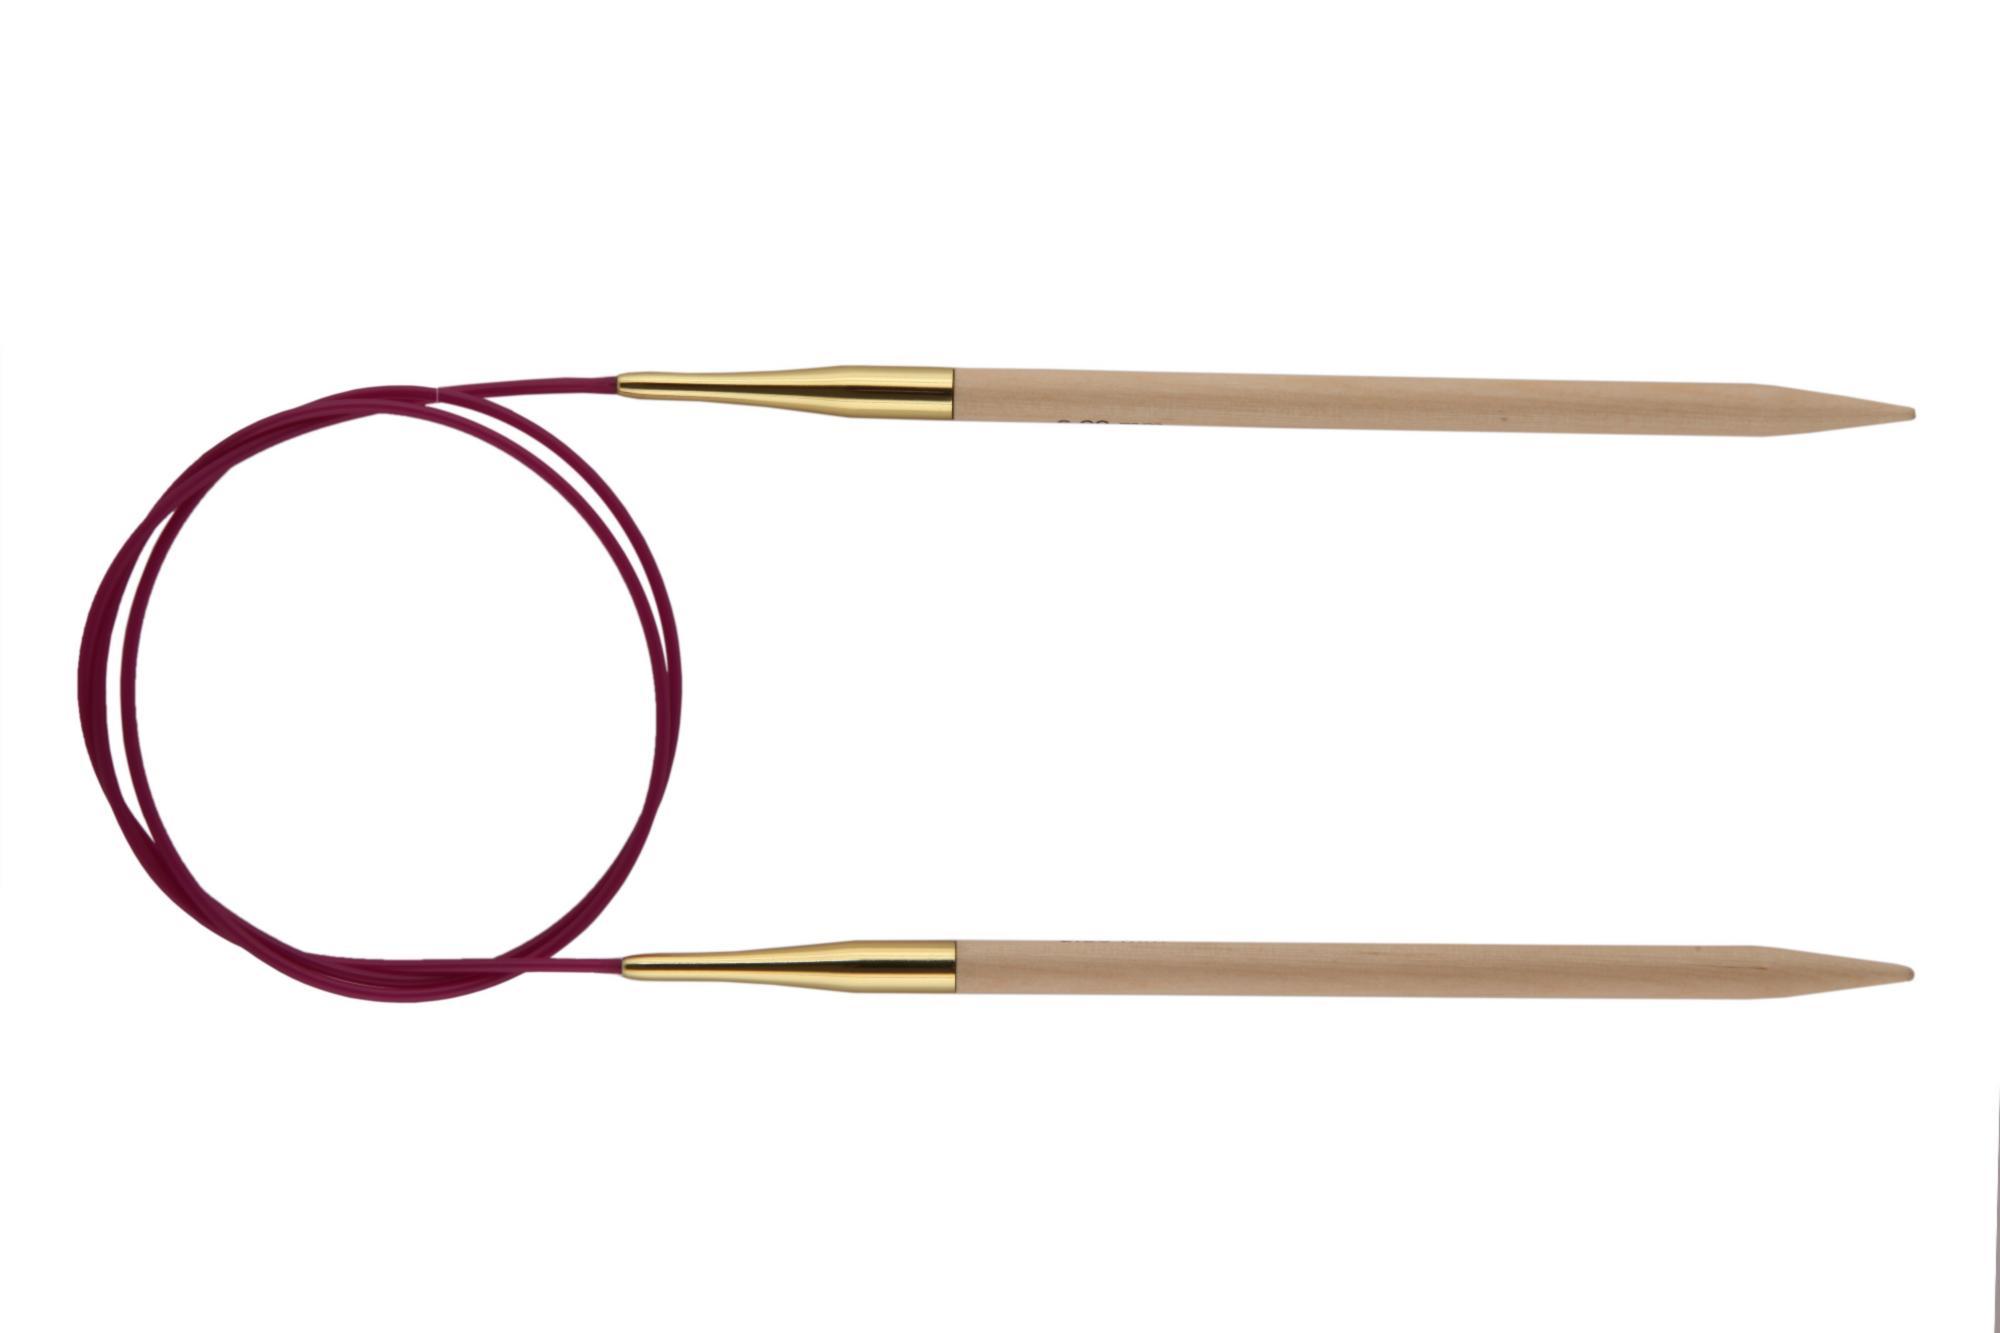 Спицы круговые 120 см Basix Birch Wood KnitPro, 35405, 4.50 мм